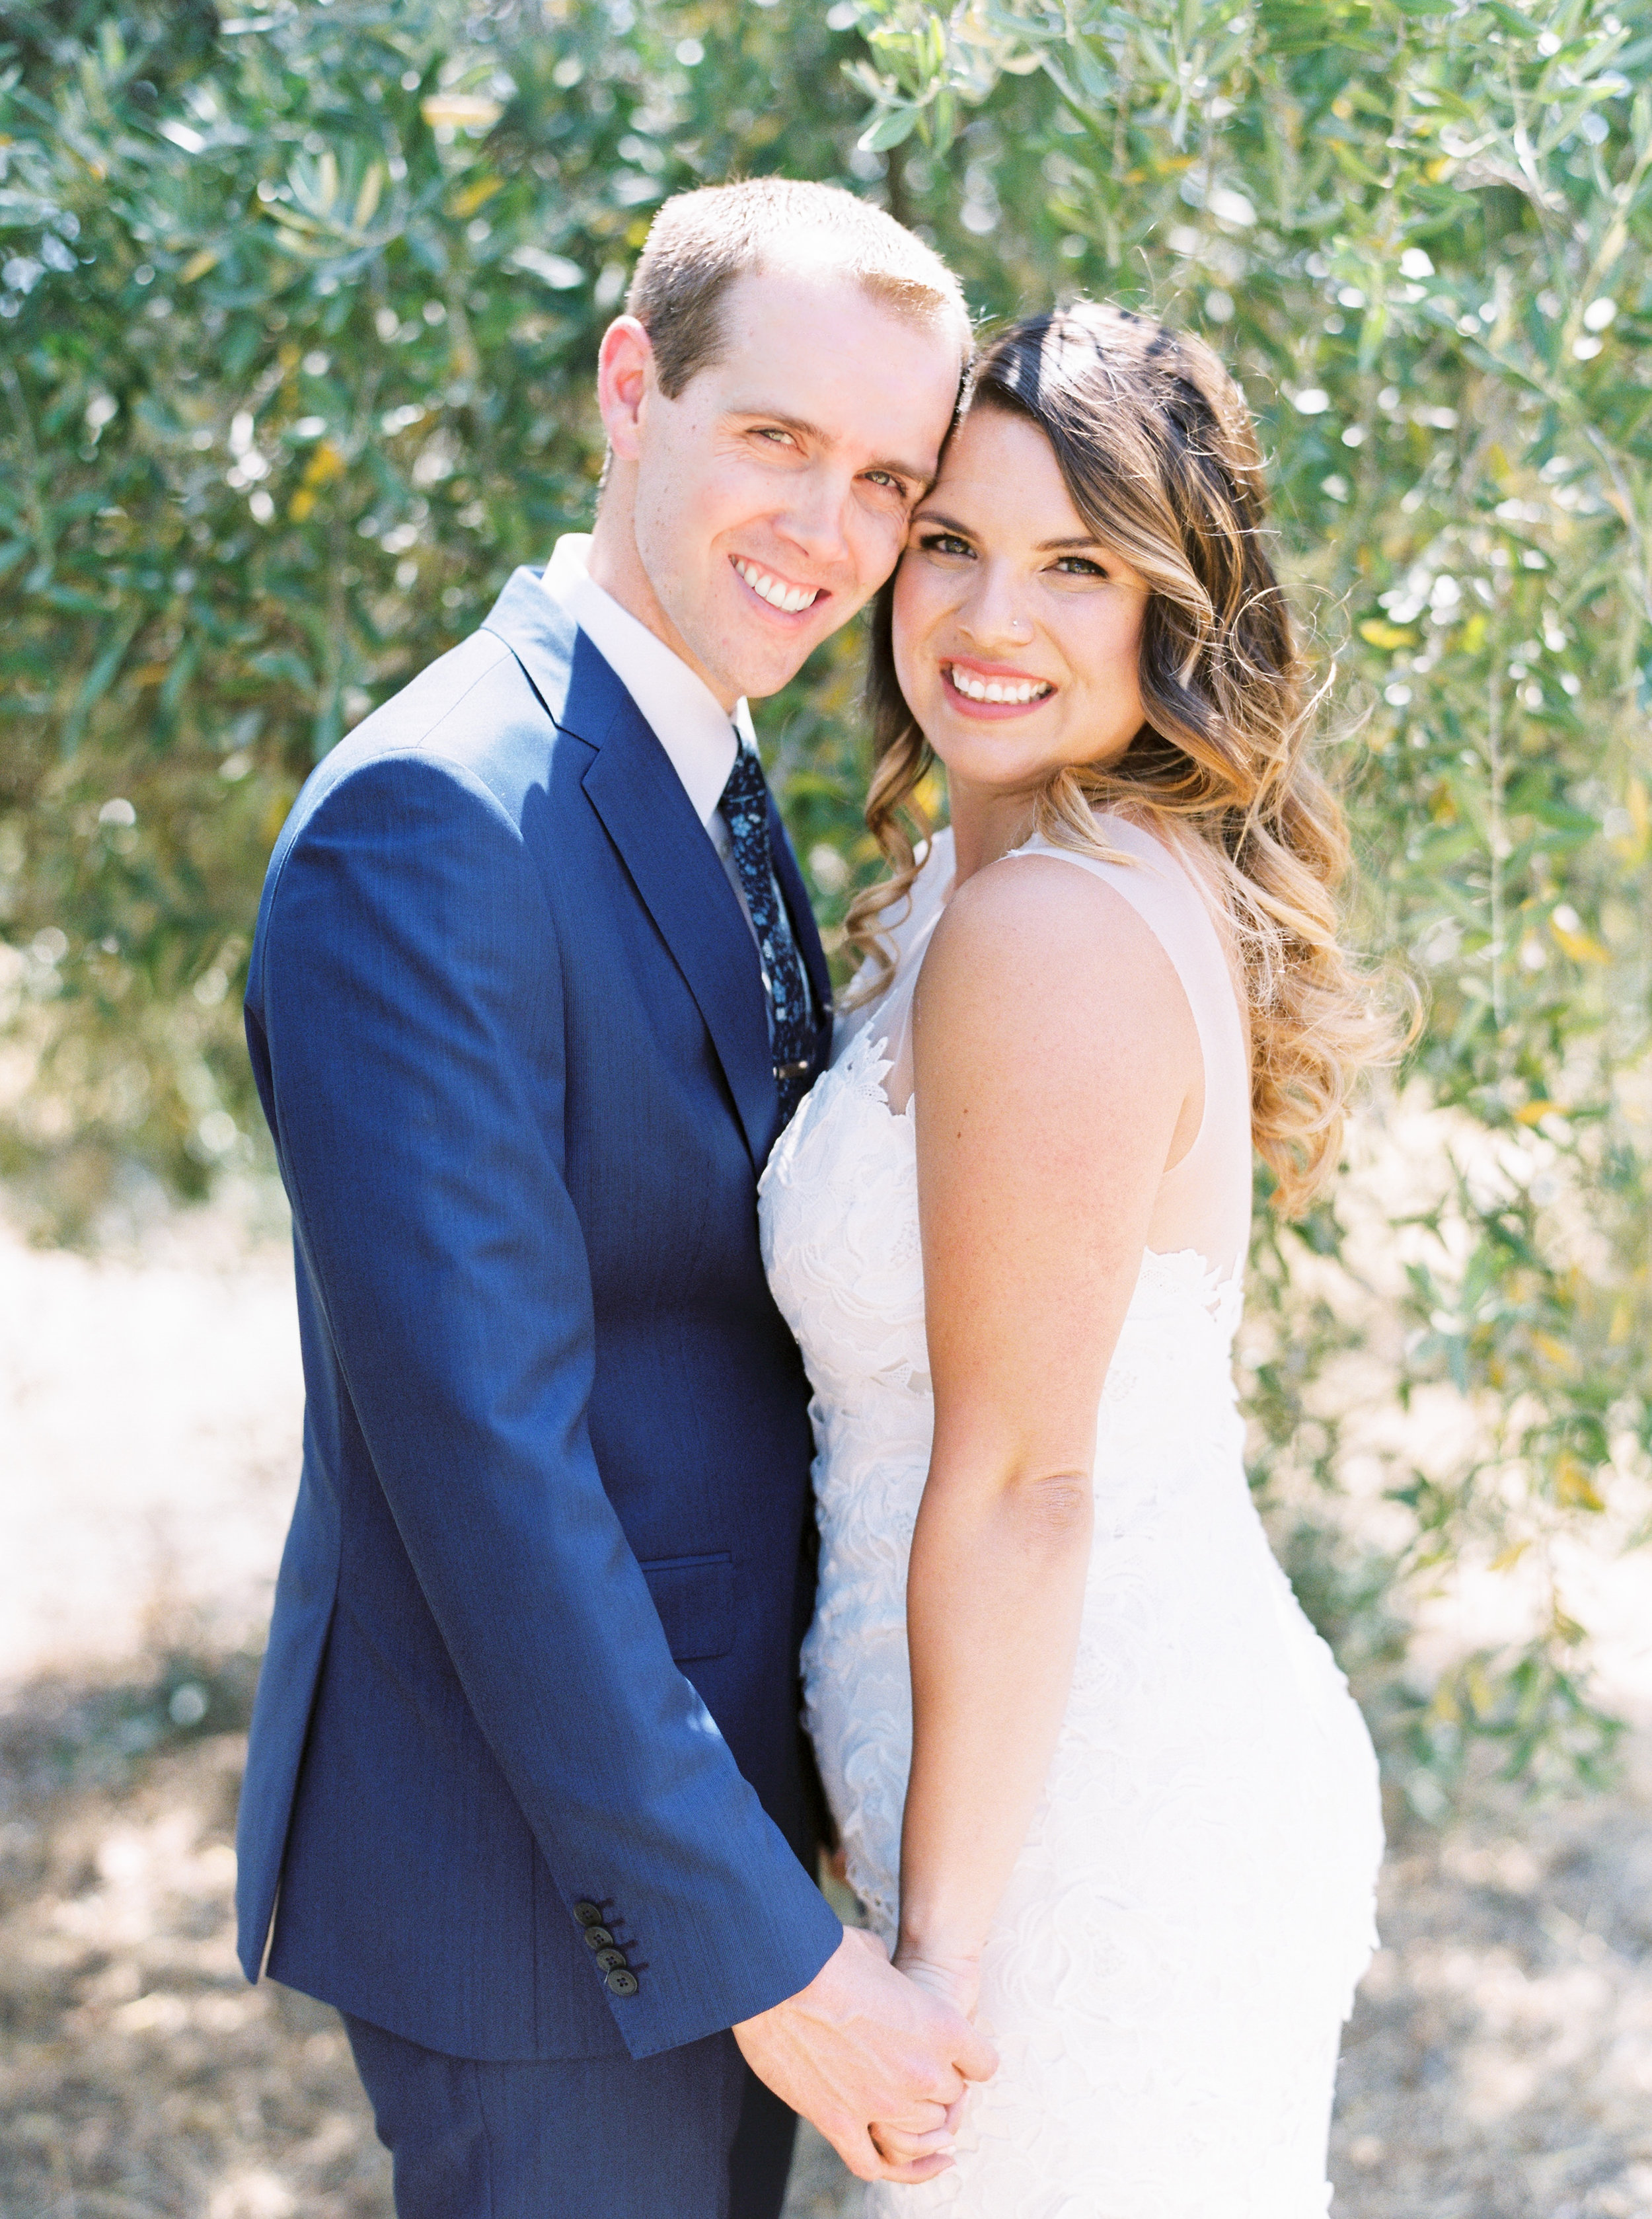 the-purple-orchid-resort-wedding-in-livermore-california-40.jpg